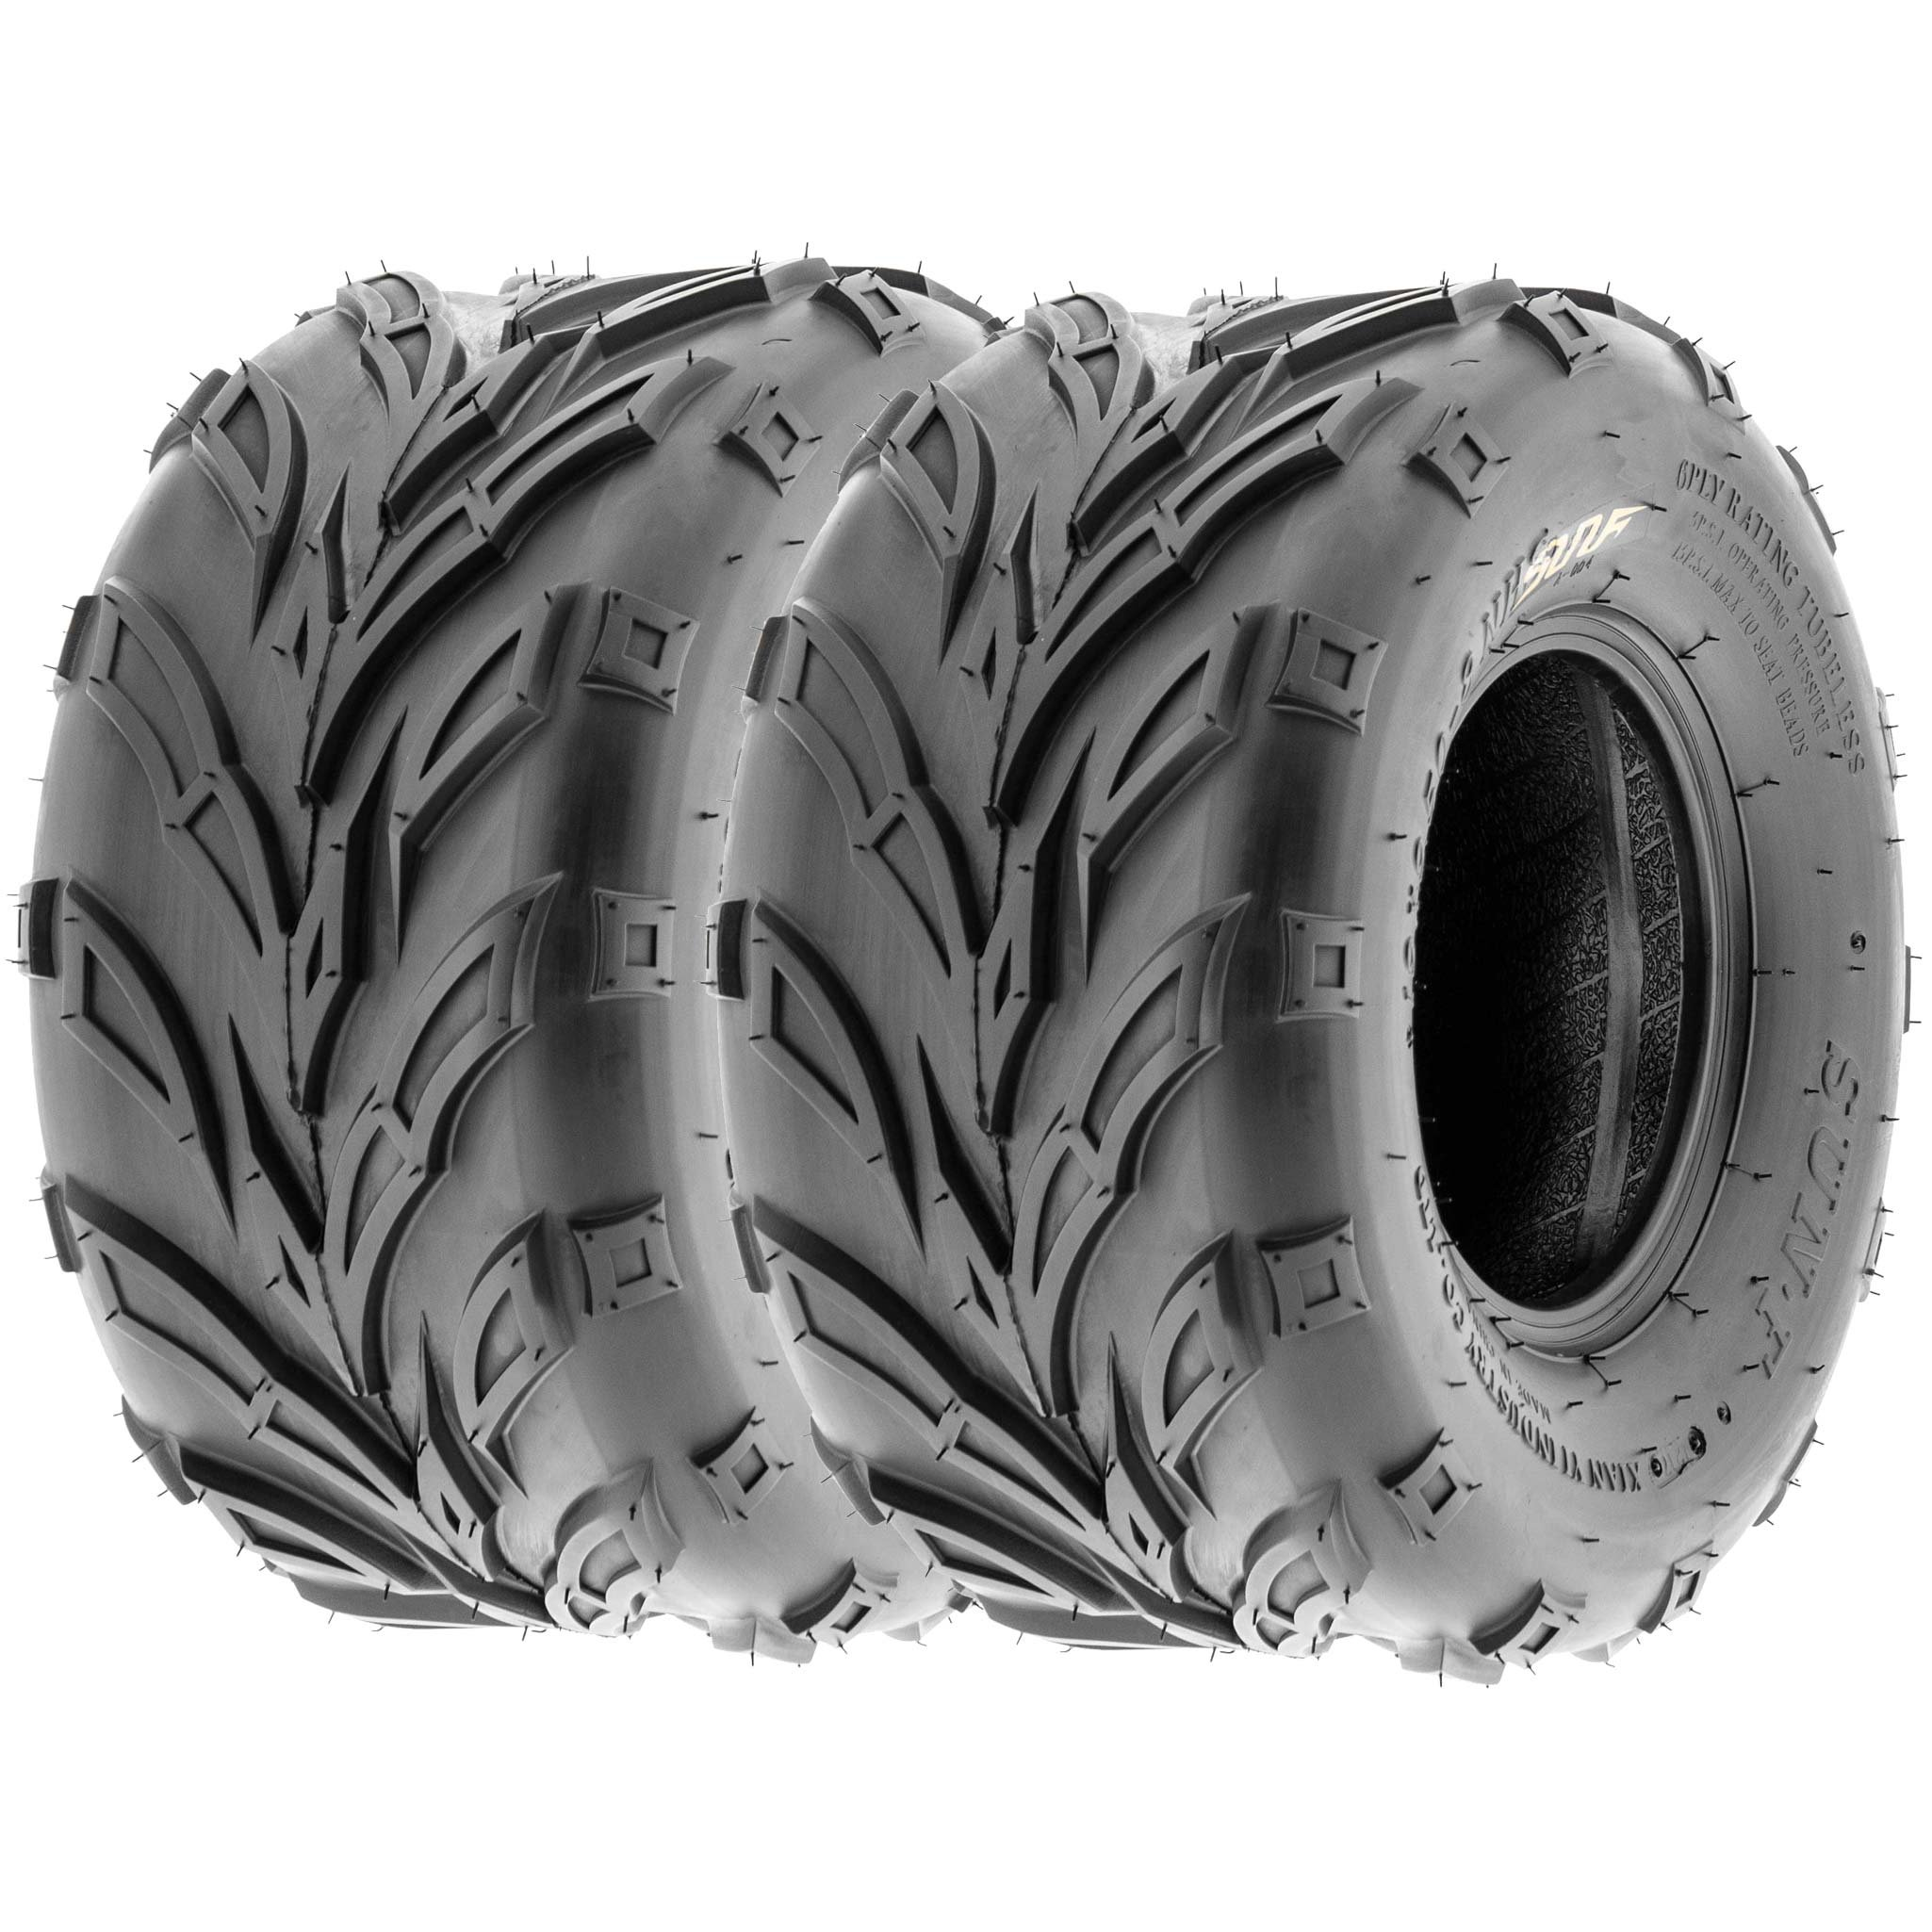 SunF 16x8-7 16x8x7 ATV UTV A/T Sport Trail Replacement 6 PR Tubeless Tires A004, [Set of 2]